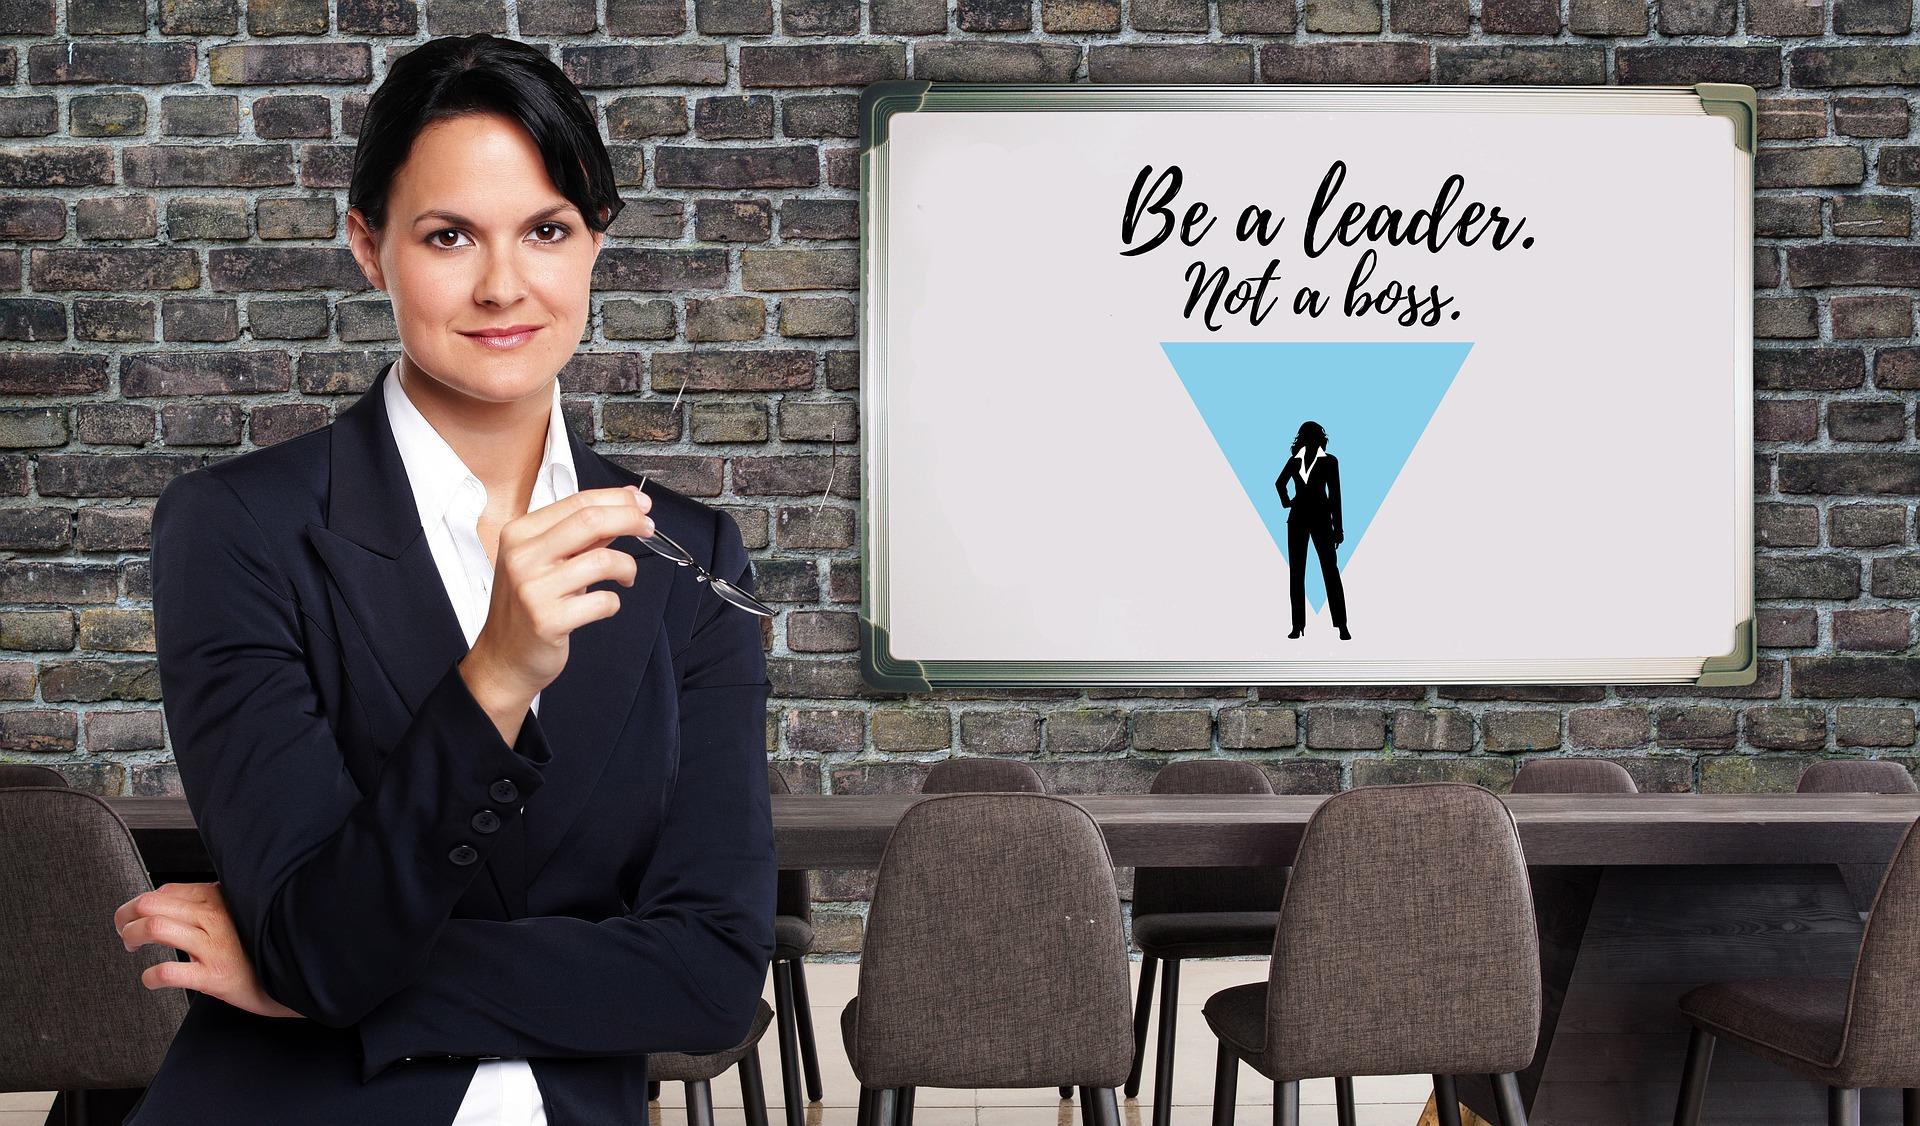 KGP Present a Workshop in Leadership